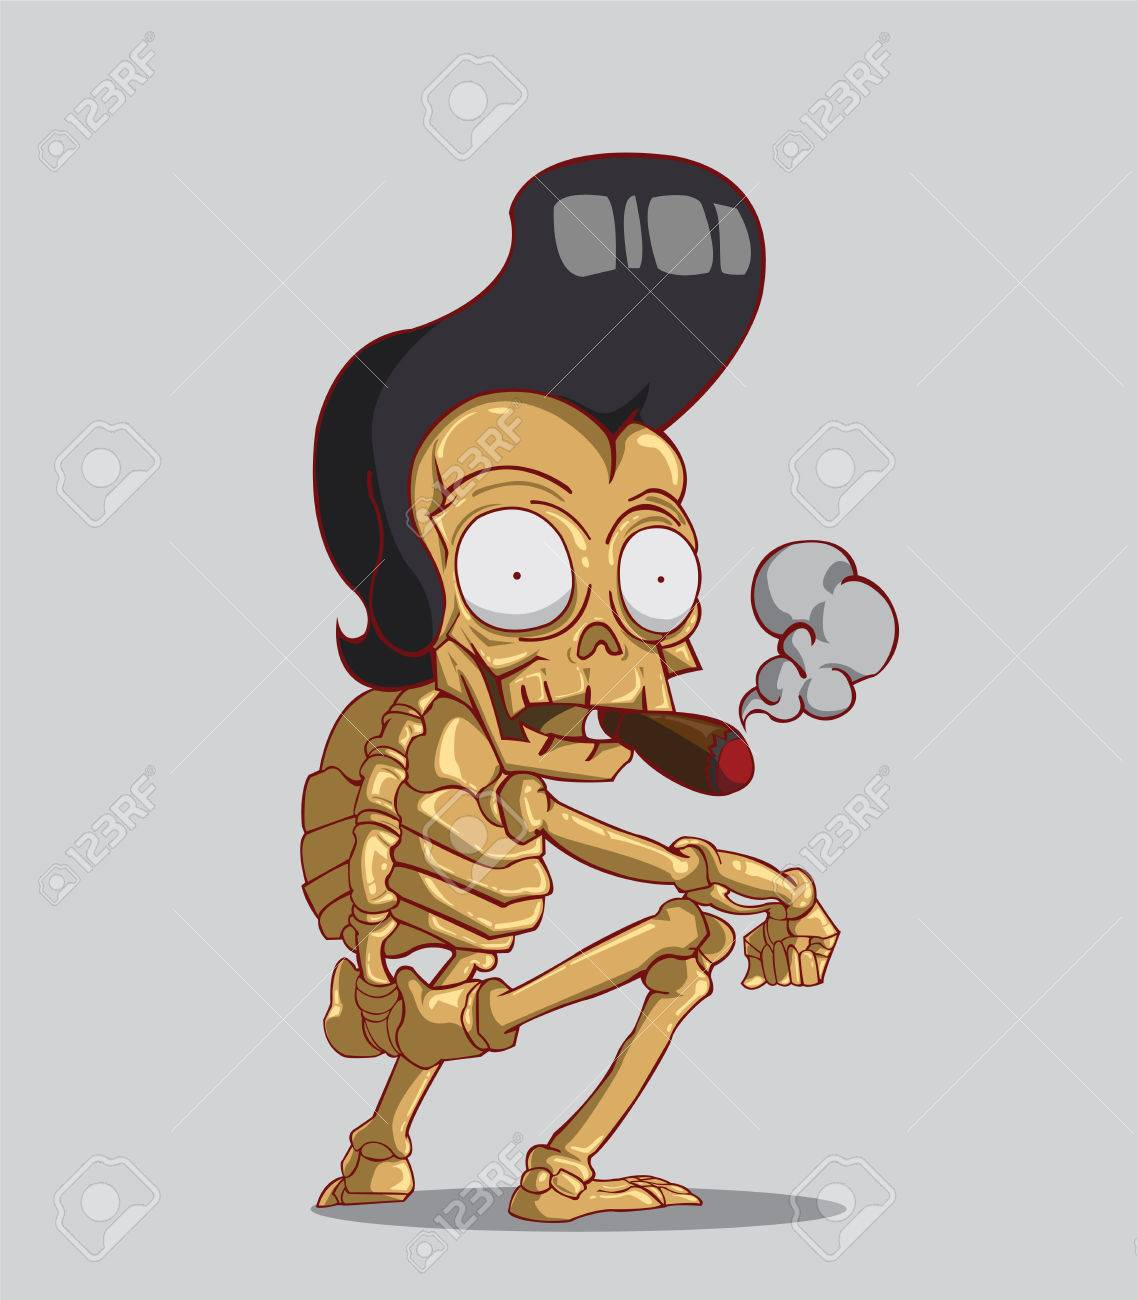 Death is a skeleton  Happy Halloween Stock Vector - 23119761